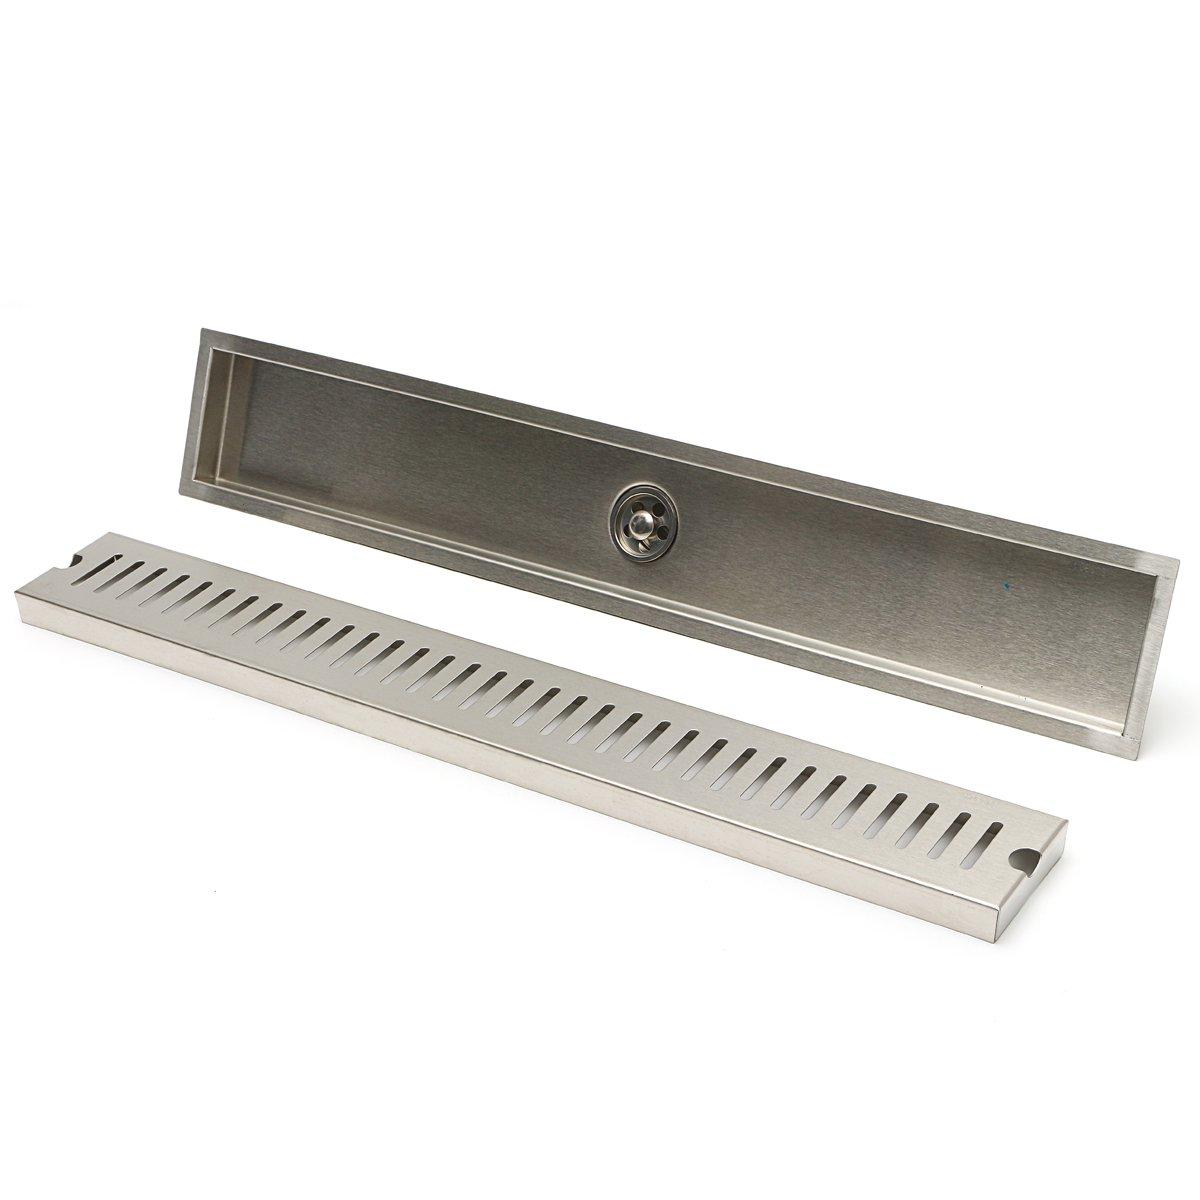 600mm Stainless Steel Drain Grate Brushed Insert Linear Bathroom Shower Floor Drain